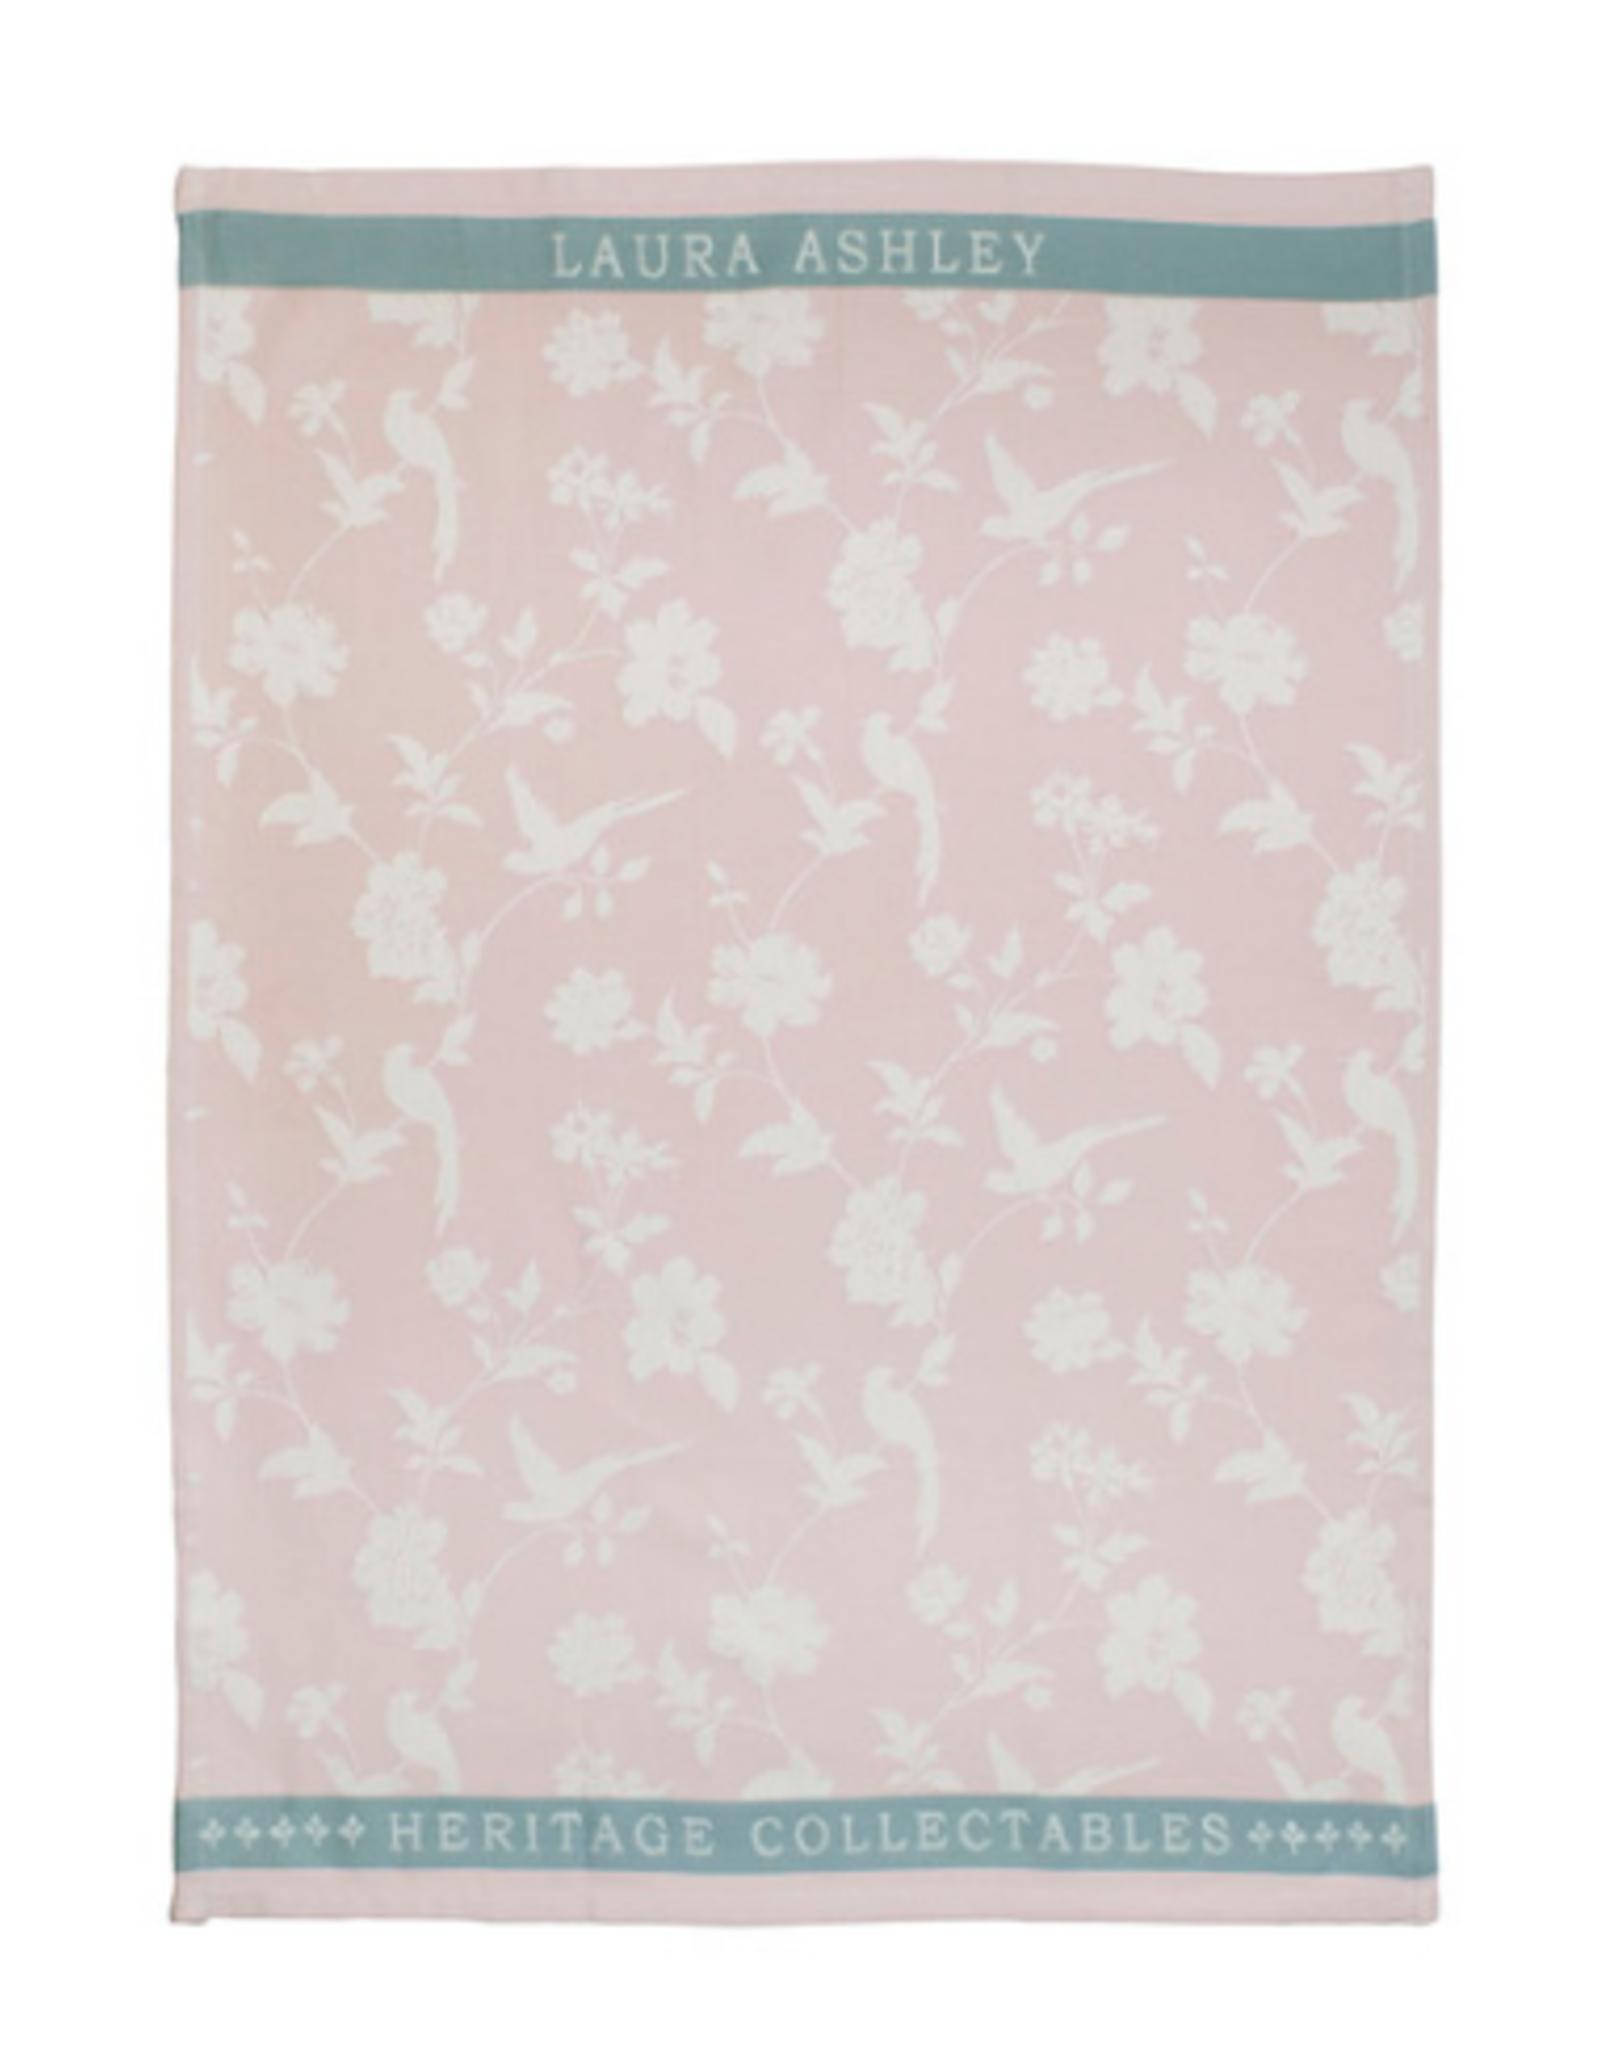 Laura Ashley Theedoek Blush Flowers - Laura Ashley